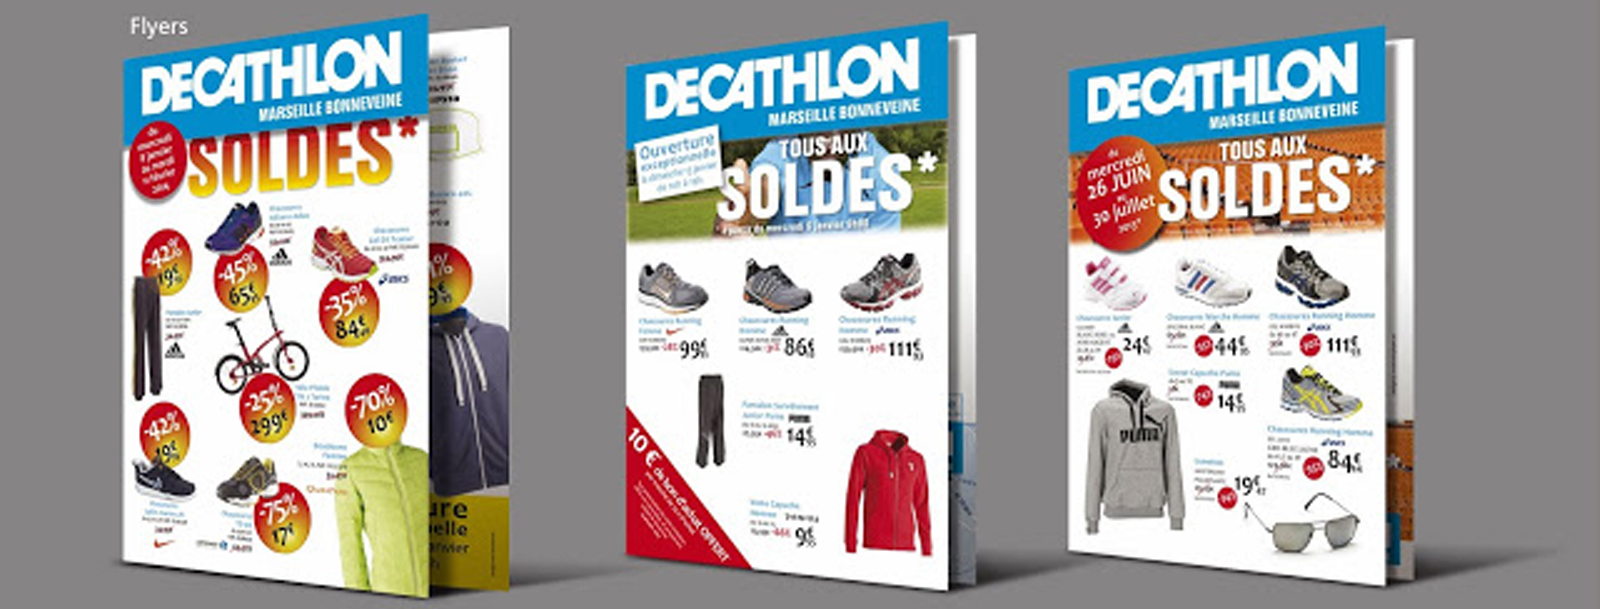 Decathlon Bonneveine soldes hiver-12 janv 2014